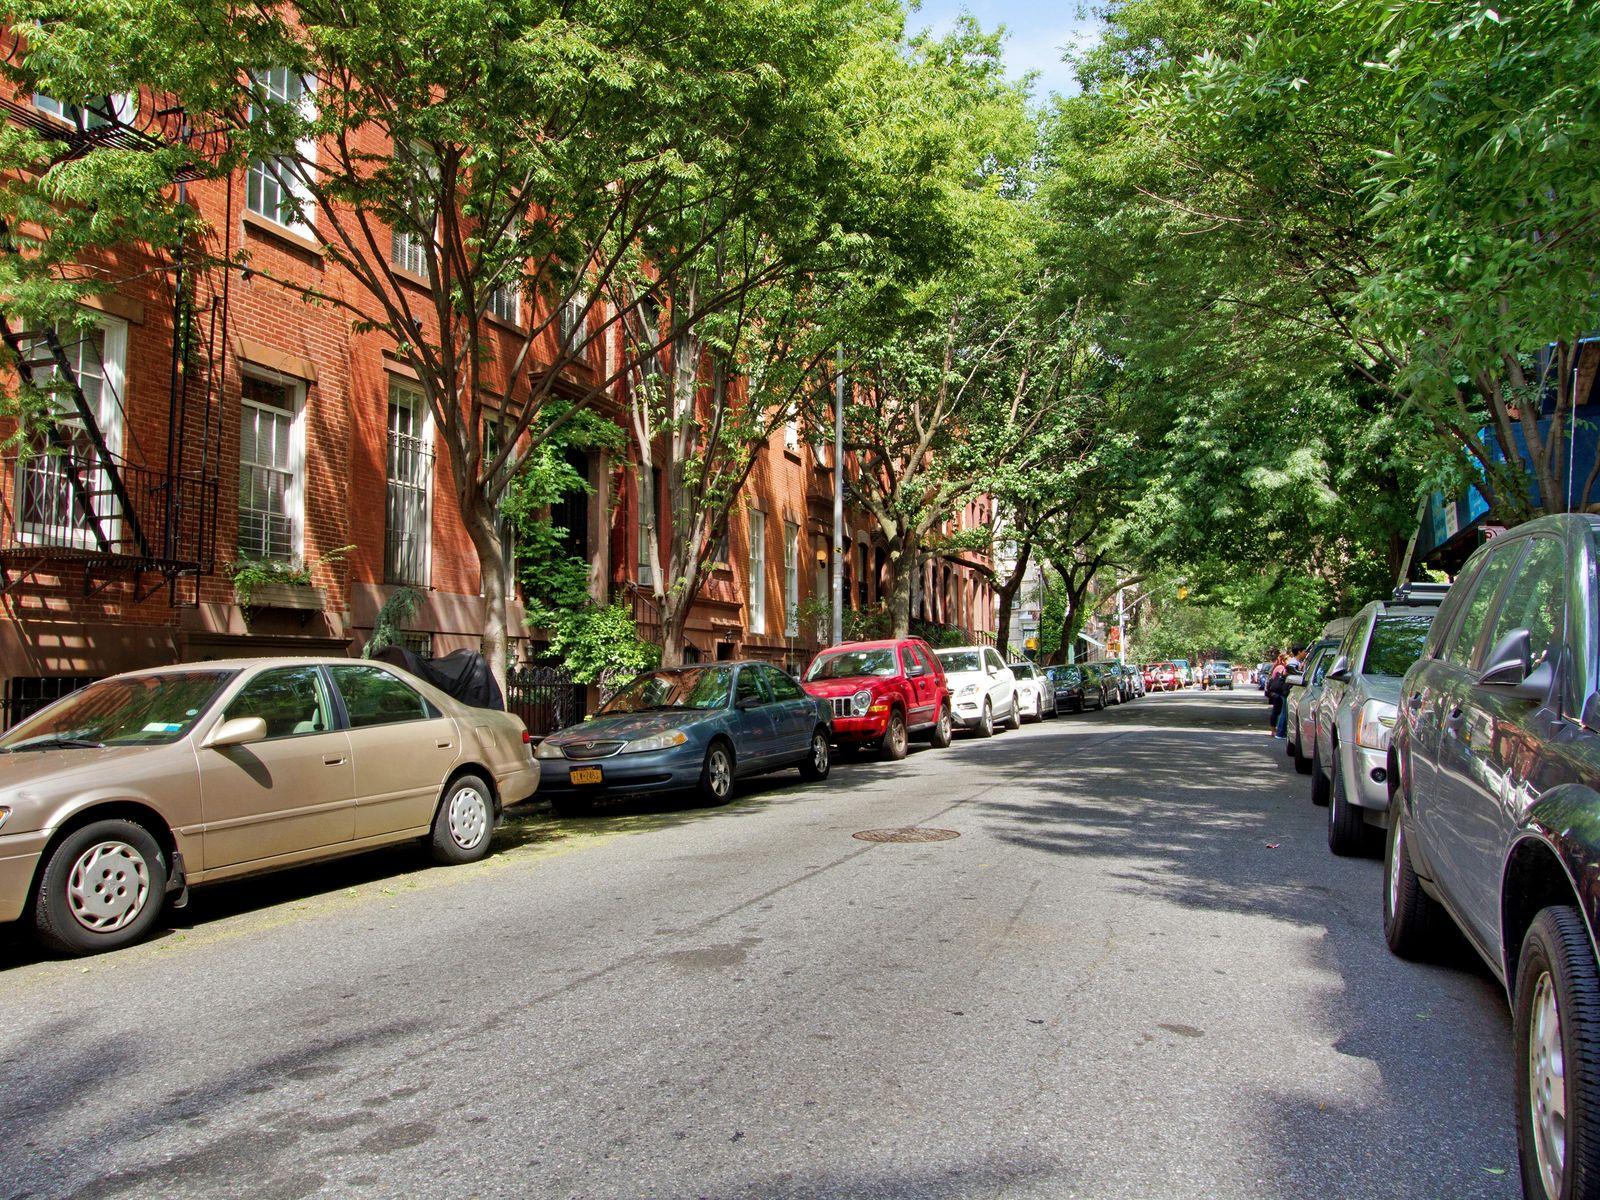 270 West 11th Street